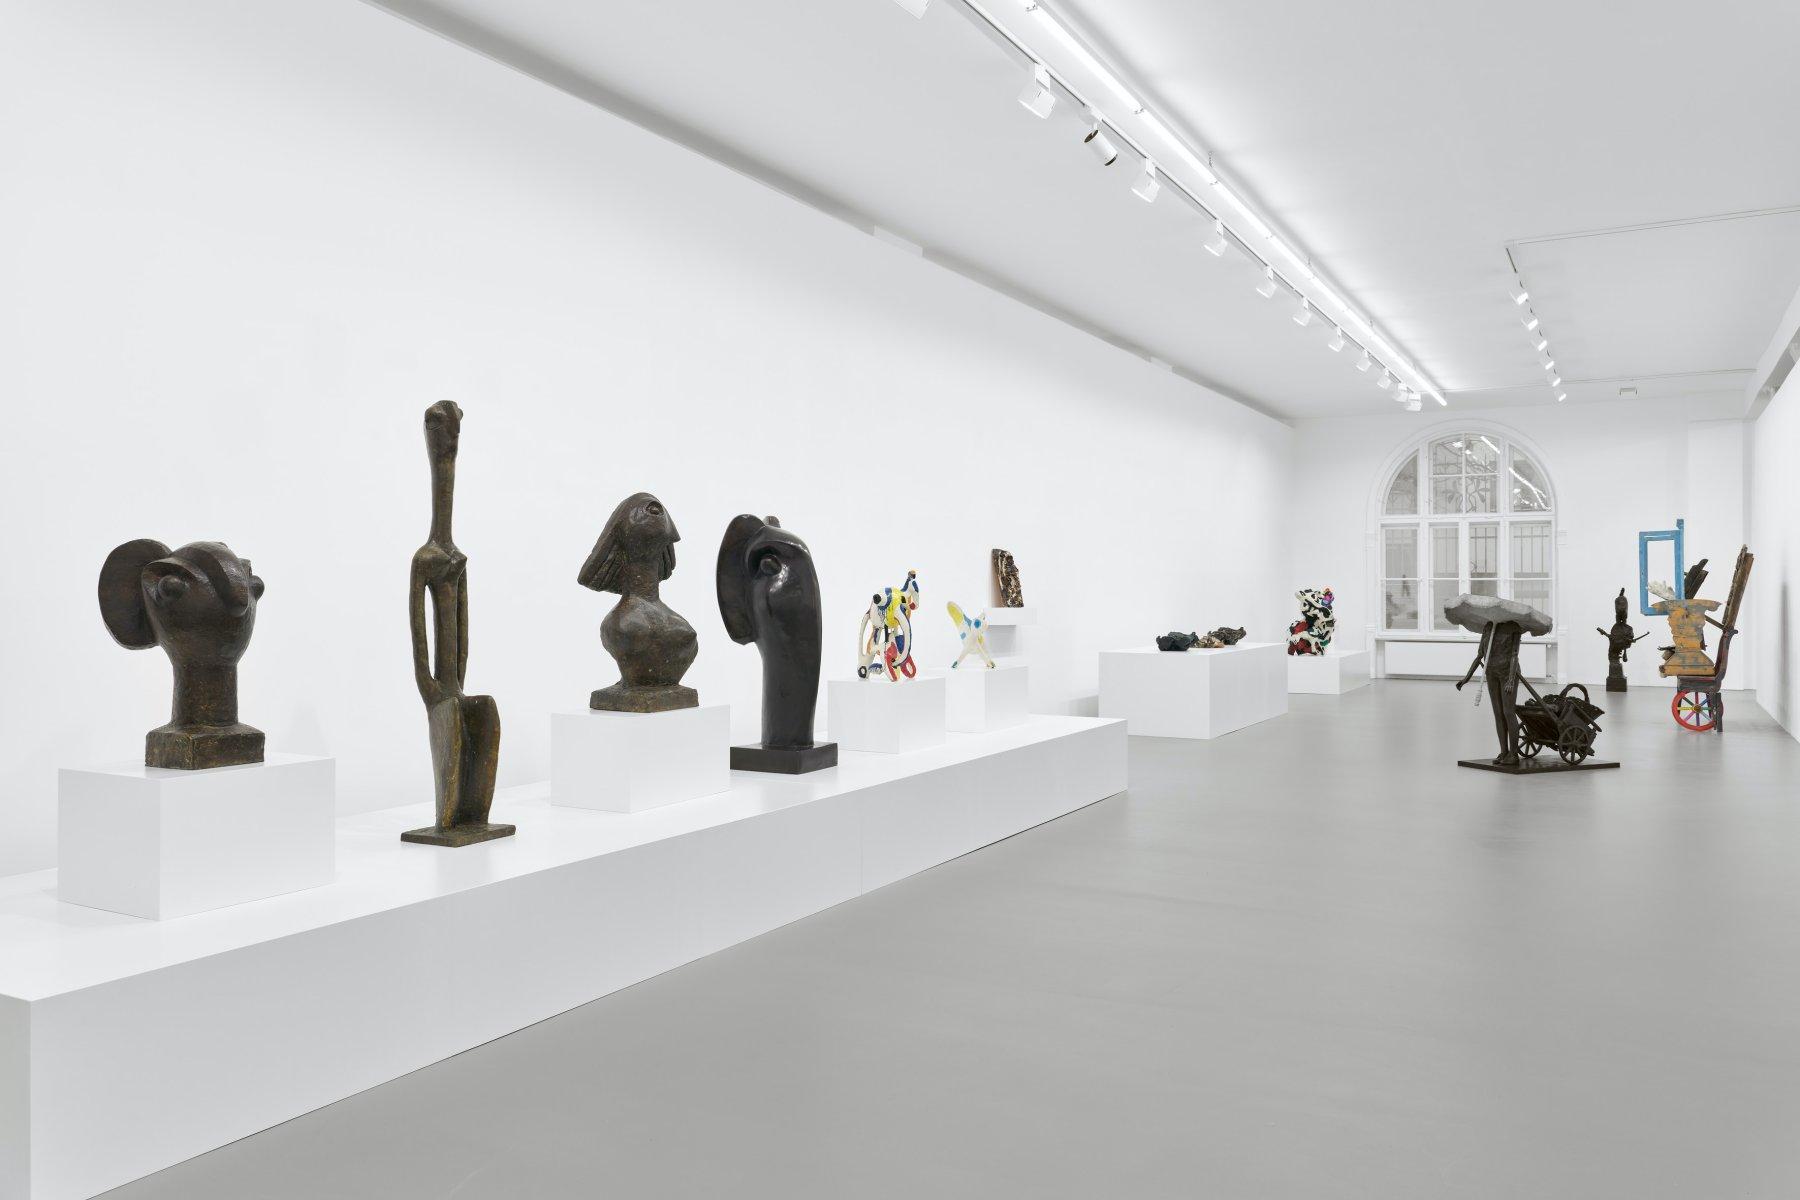 Galerie Max Hetzler Goethestrasse Karel Appel 1